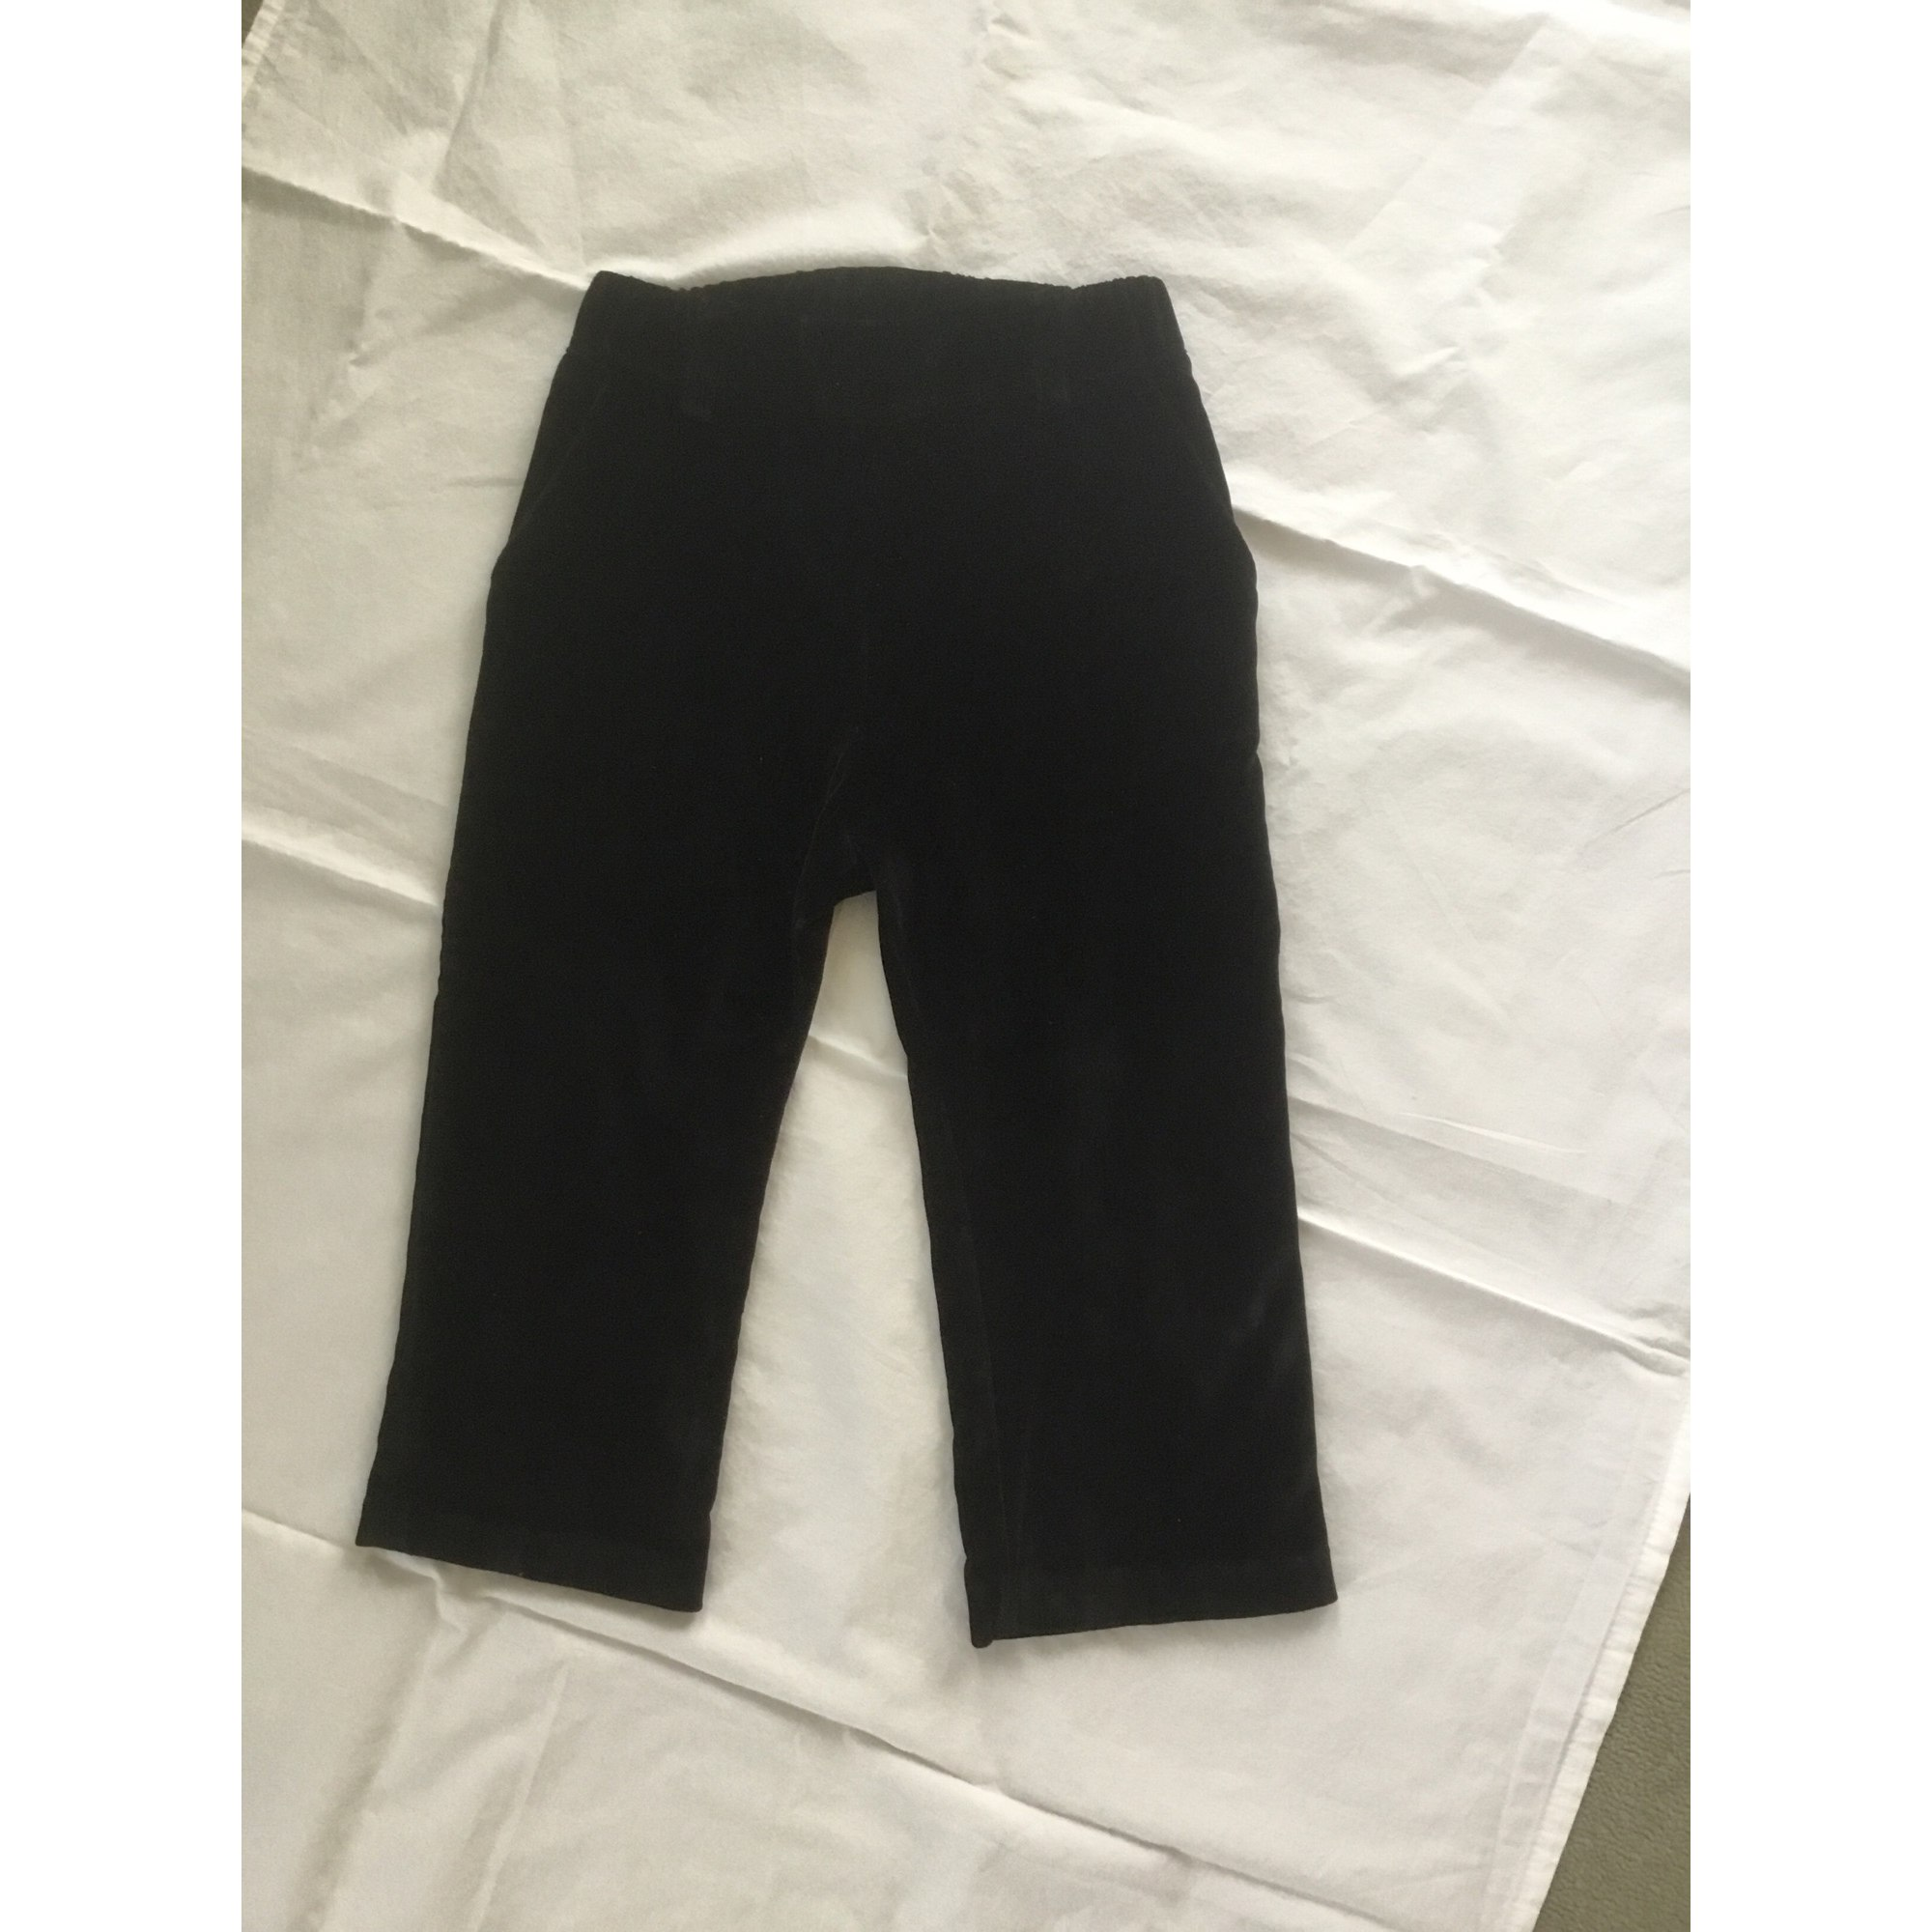 Pants BABY DIOR Black